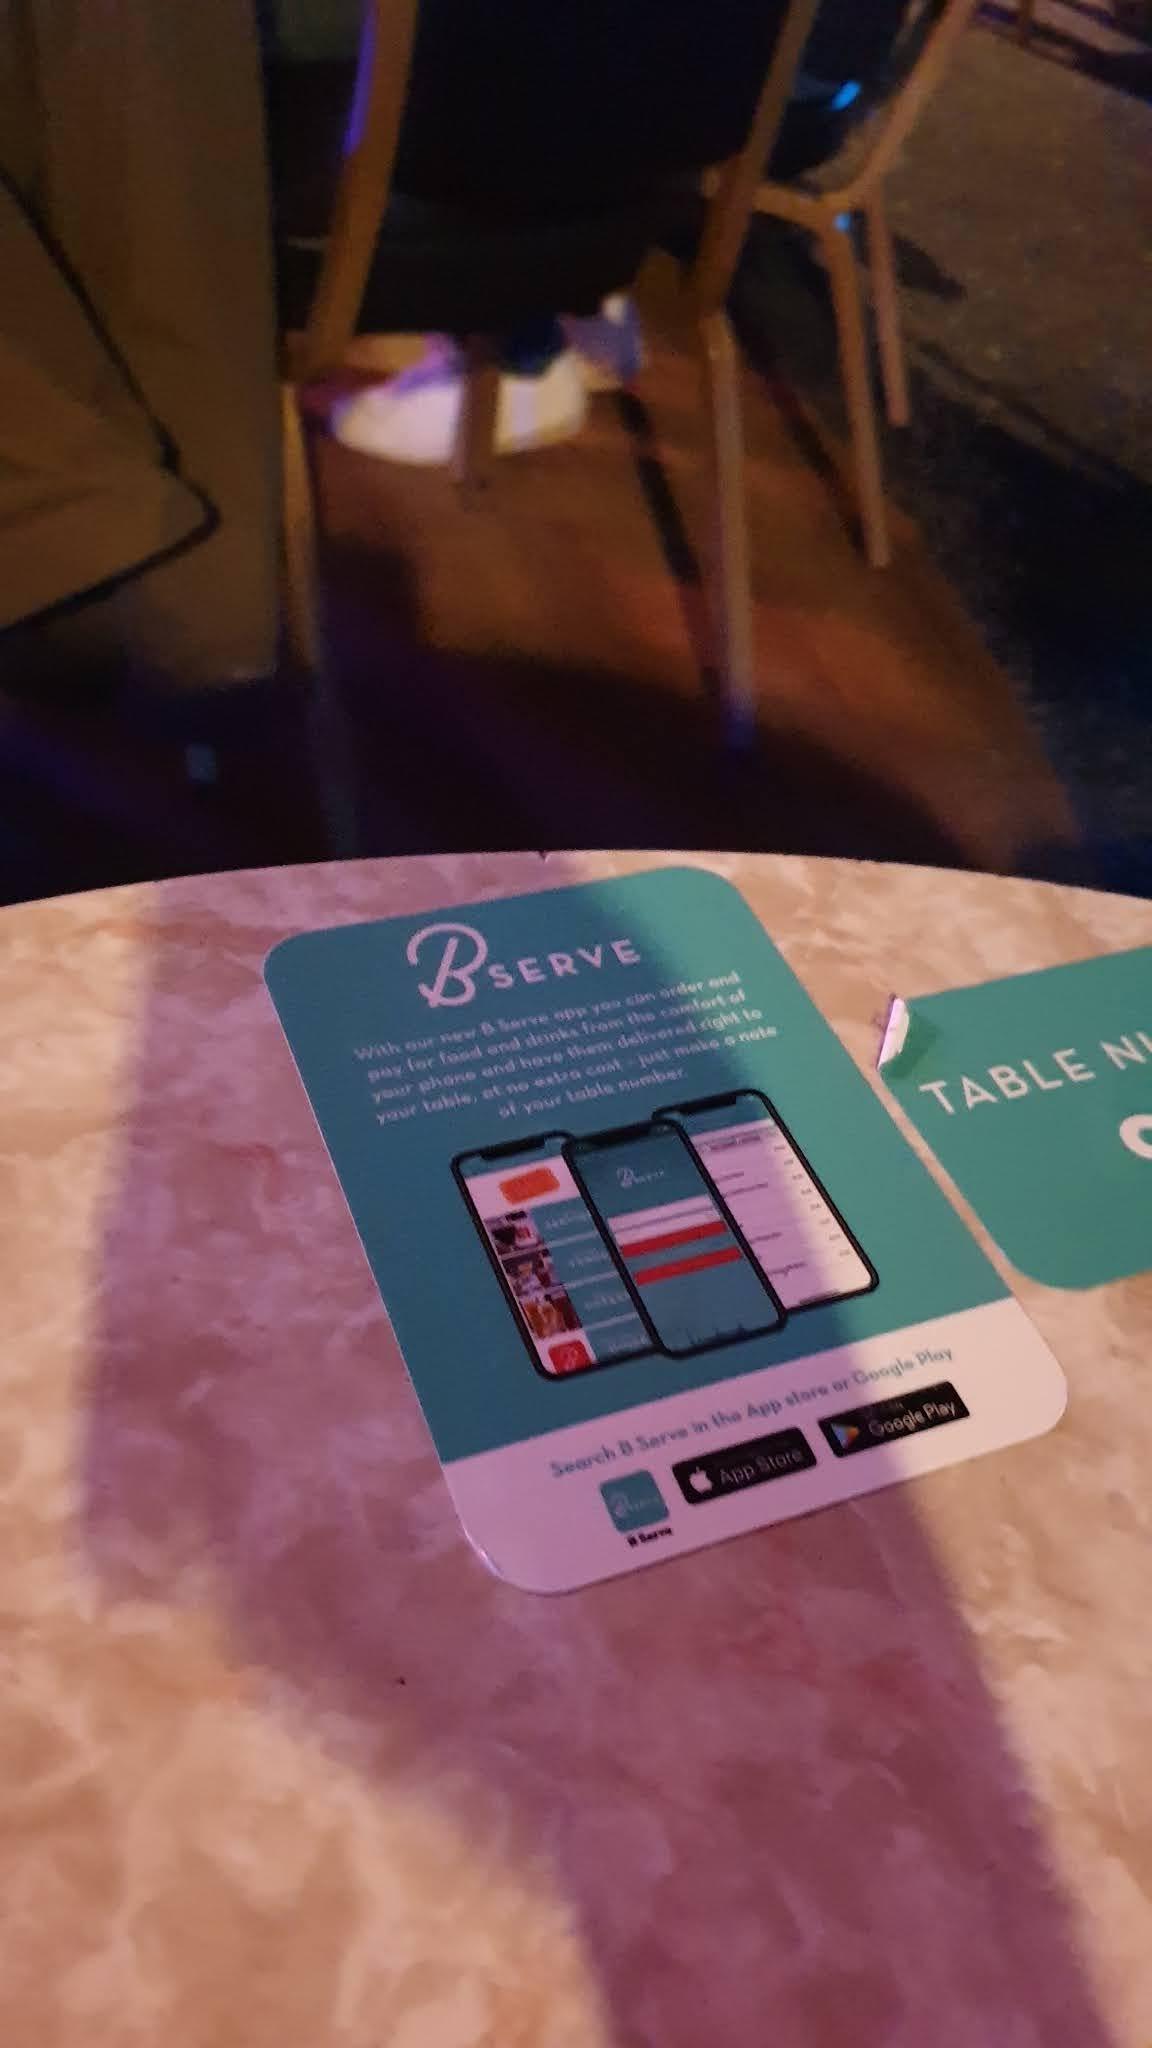 b serve app sign